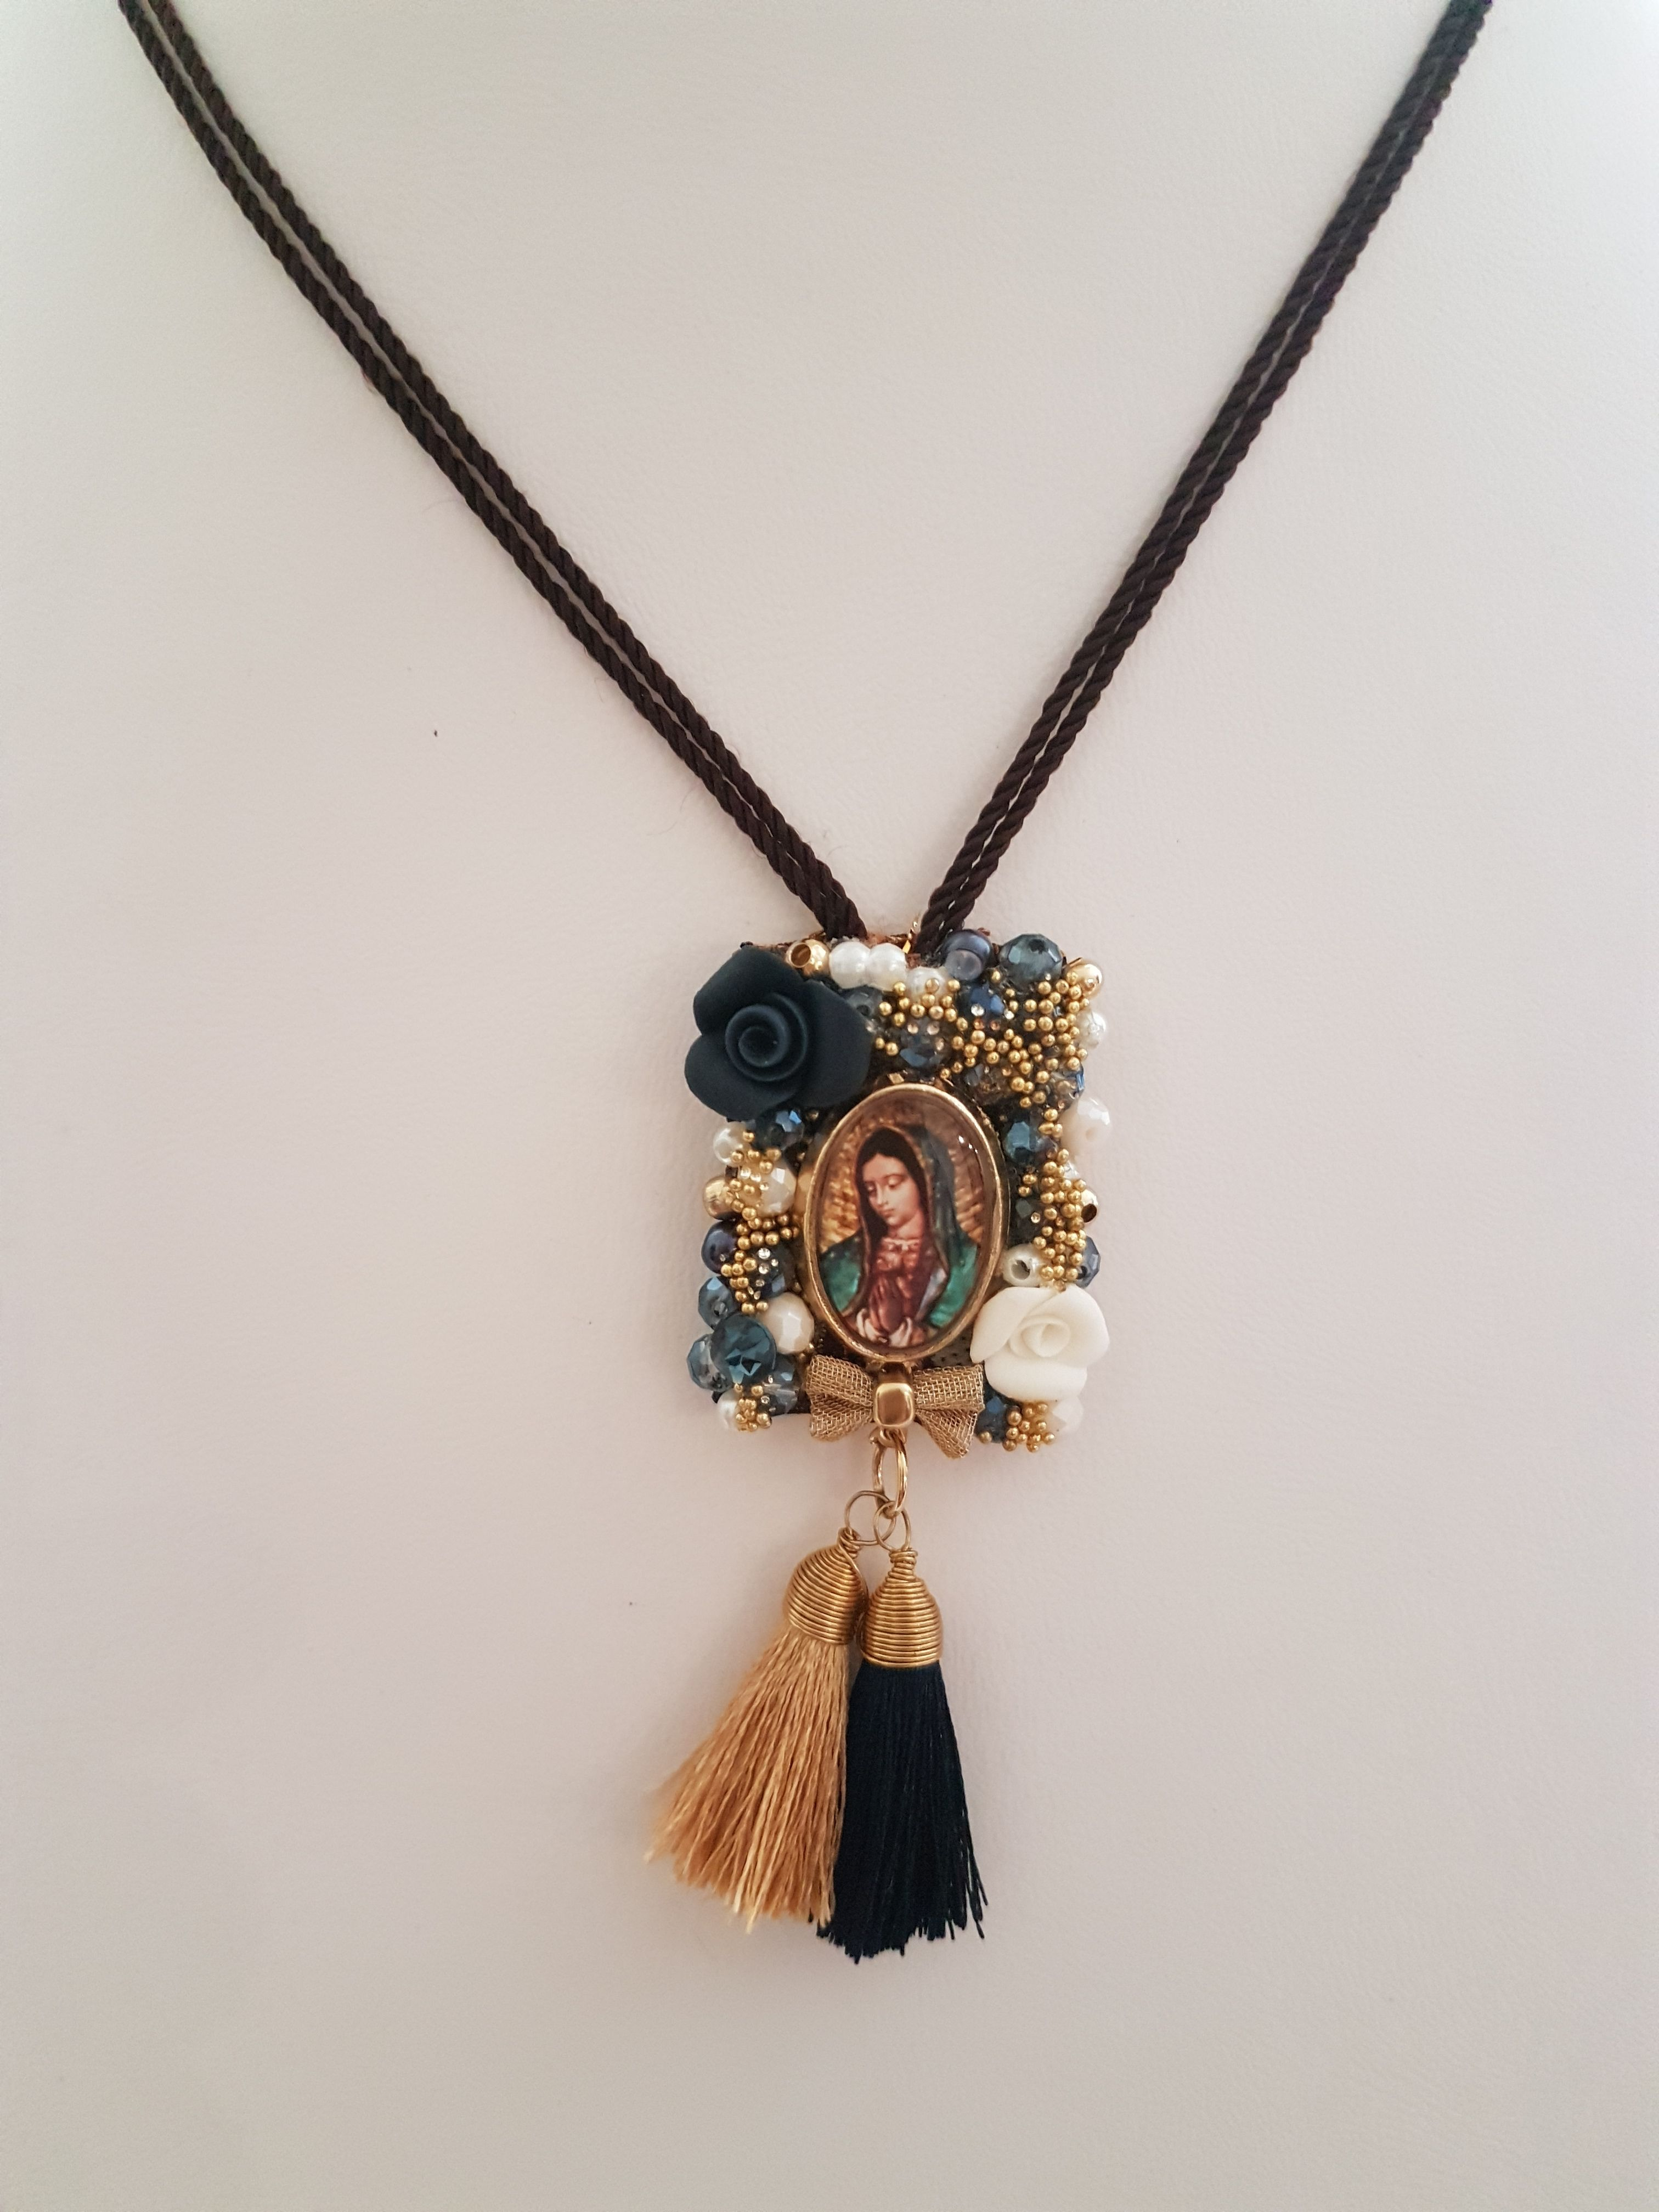 db3417b48c4d Escapulario Virgen Guadalupe bordado a Mano. Beautiful Scapular Lady  Guadalupe. Artesania Mexicana Collar Hecho